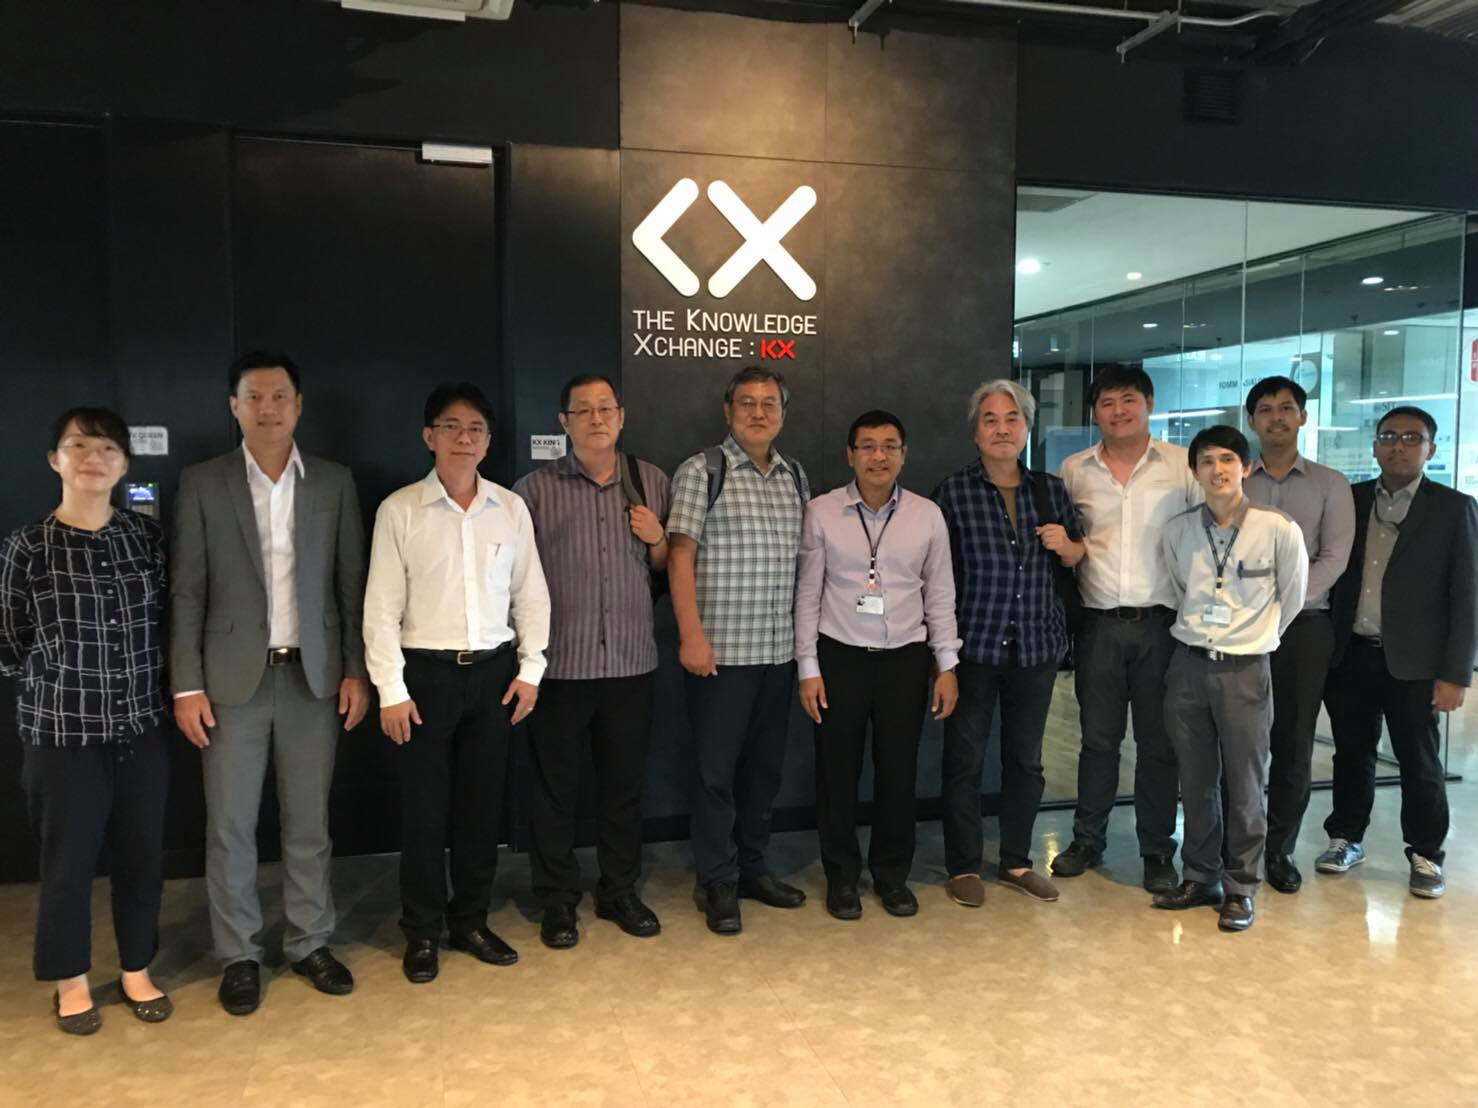 Korea Advanced Institute of Science and Technology เข้าหารือความร่วมมือการพัฒนาเทคโนโลยียานยนต์ในประเทศไทย